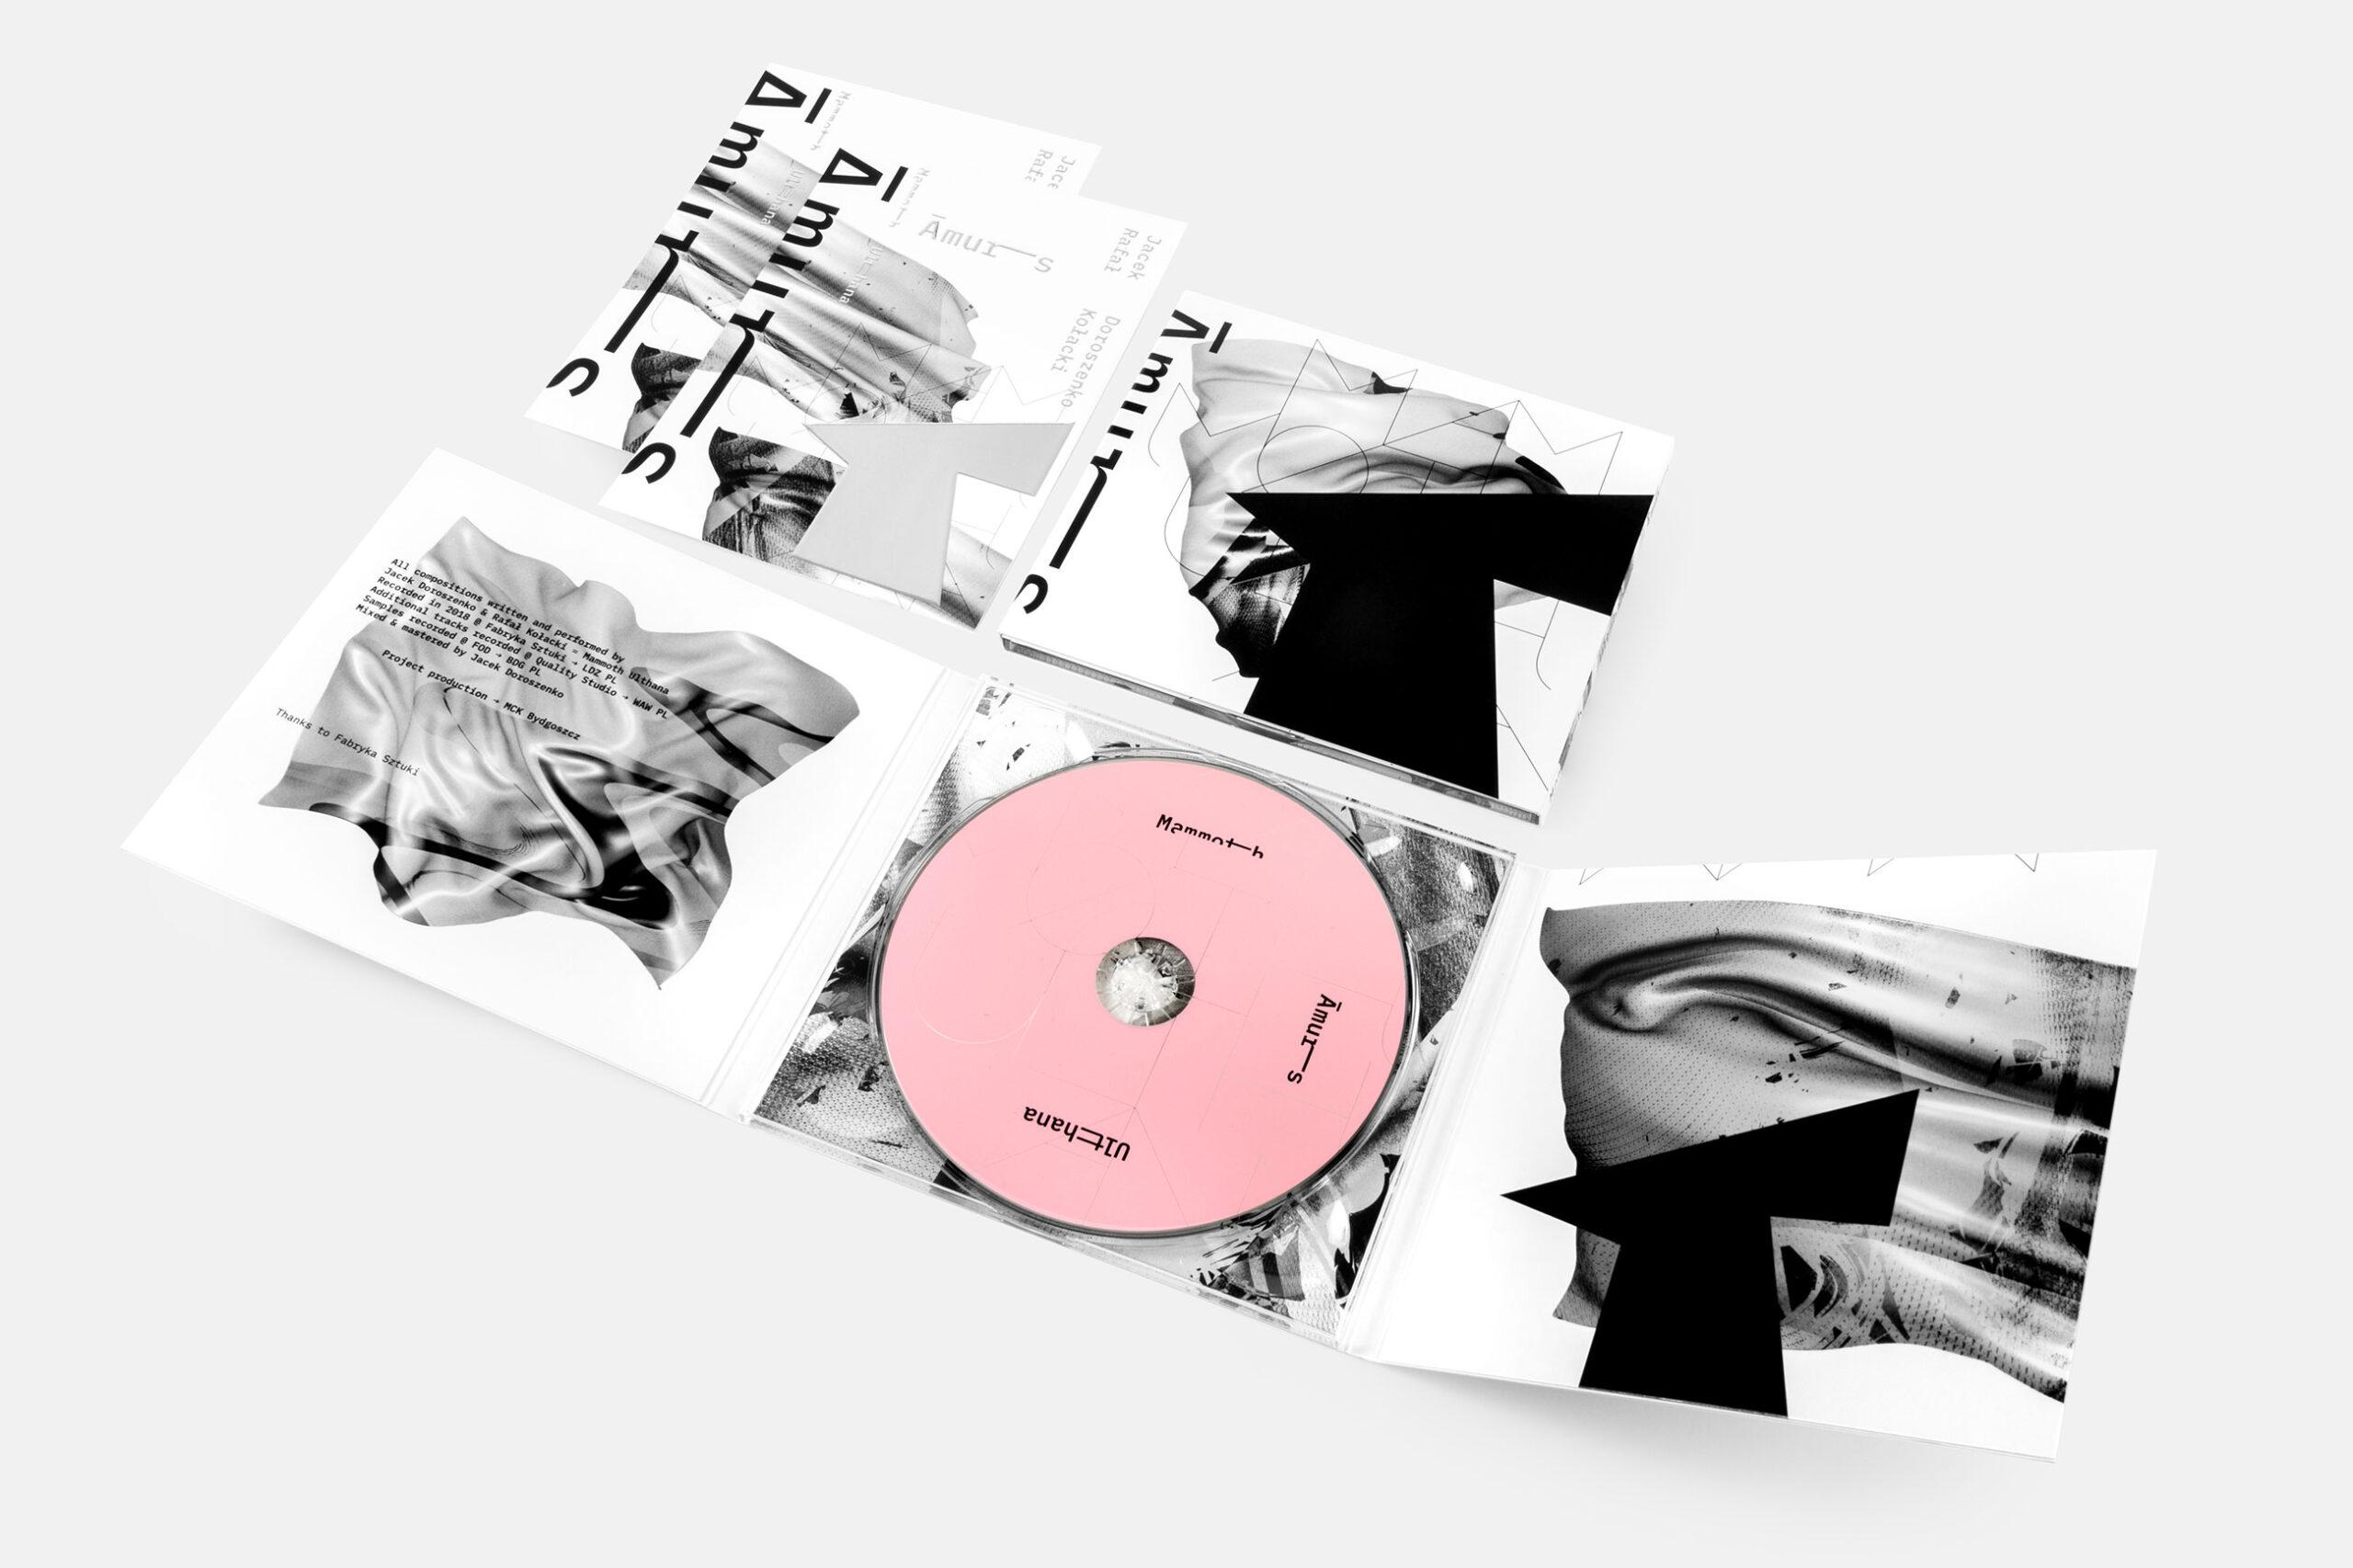 Contemporary artist Jacek Doroszenko - Amurs, music album 03